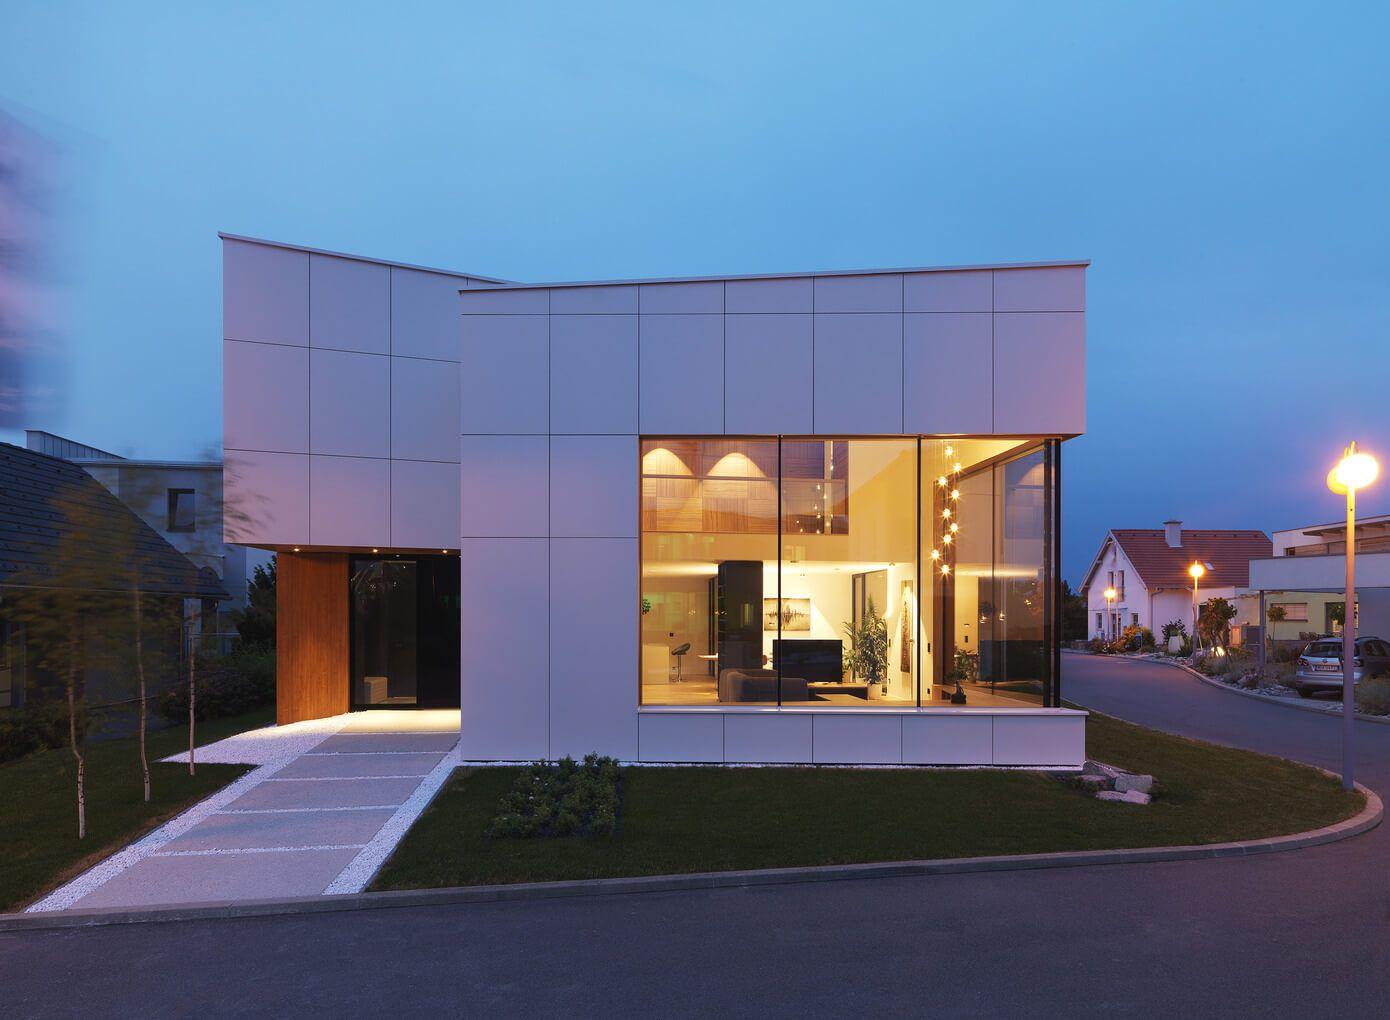 Fachada principal de la casa (Fotos: Matevž Paternoster / Diseño: Sono Arhitekti)